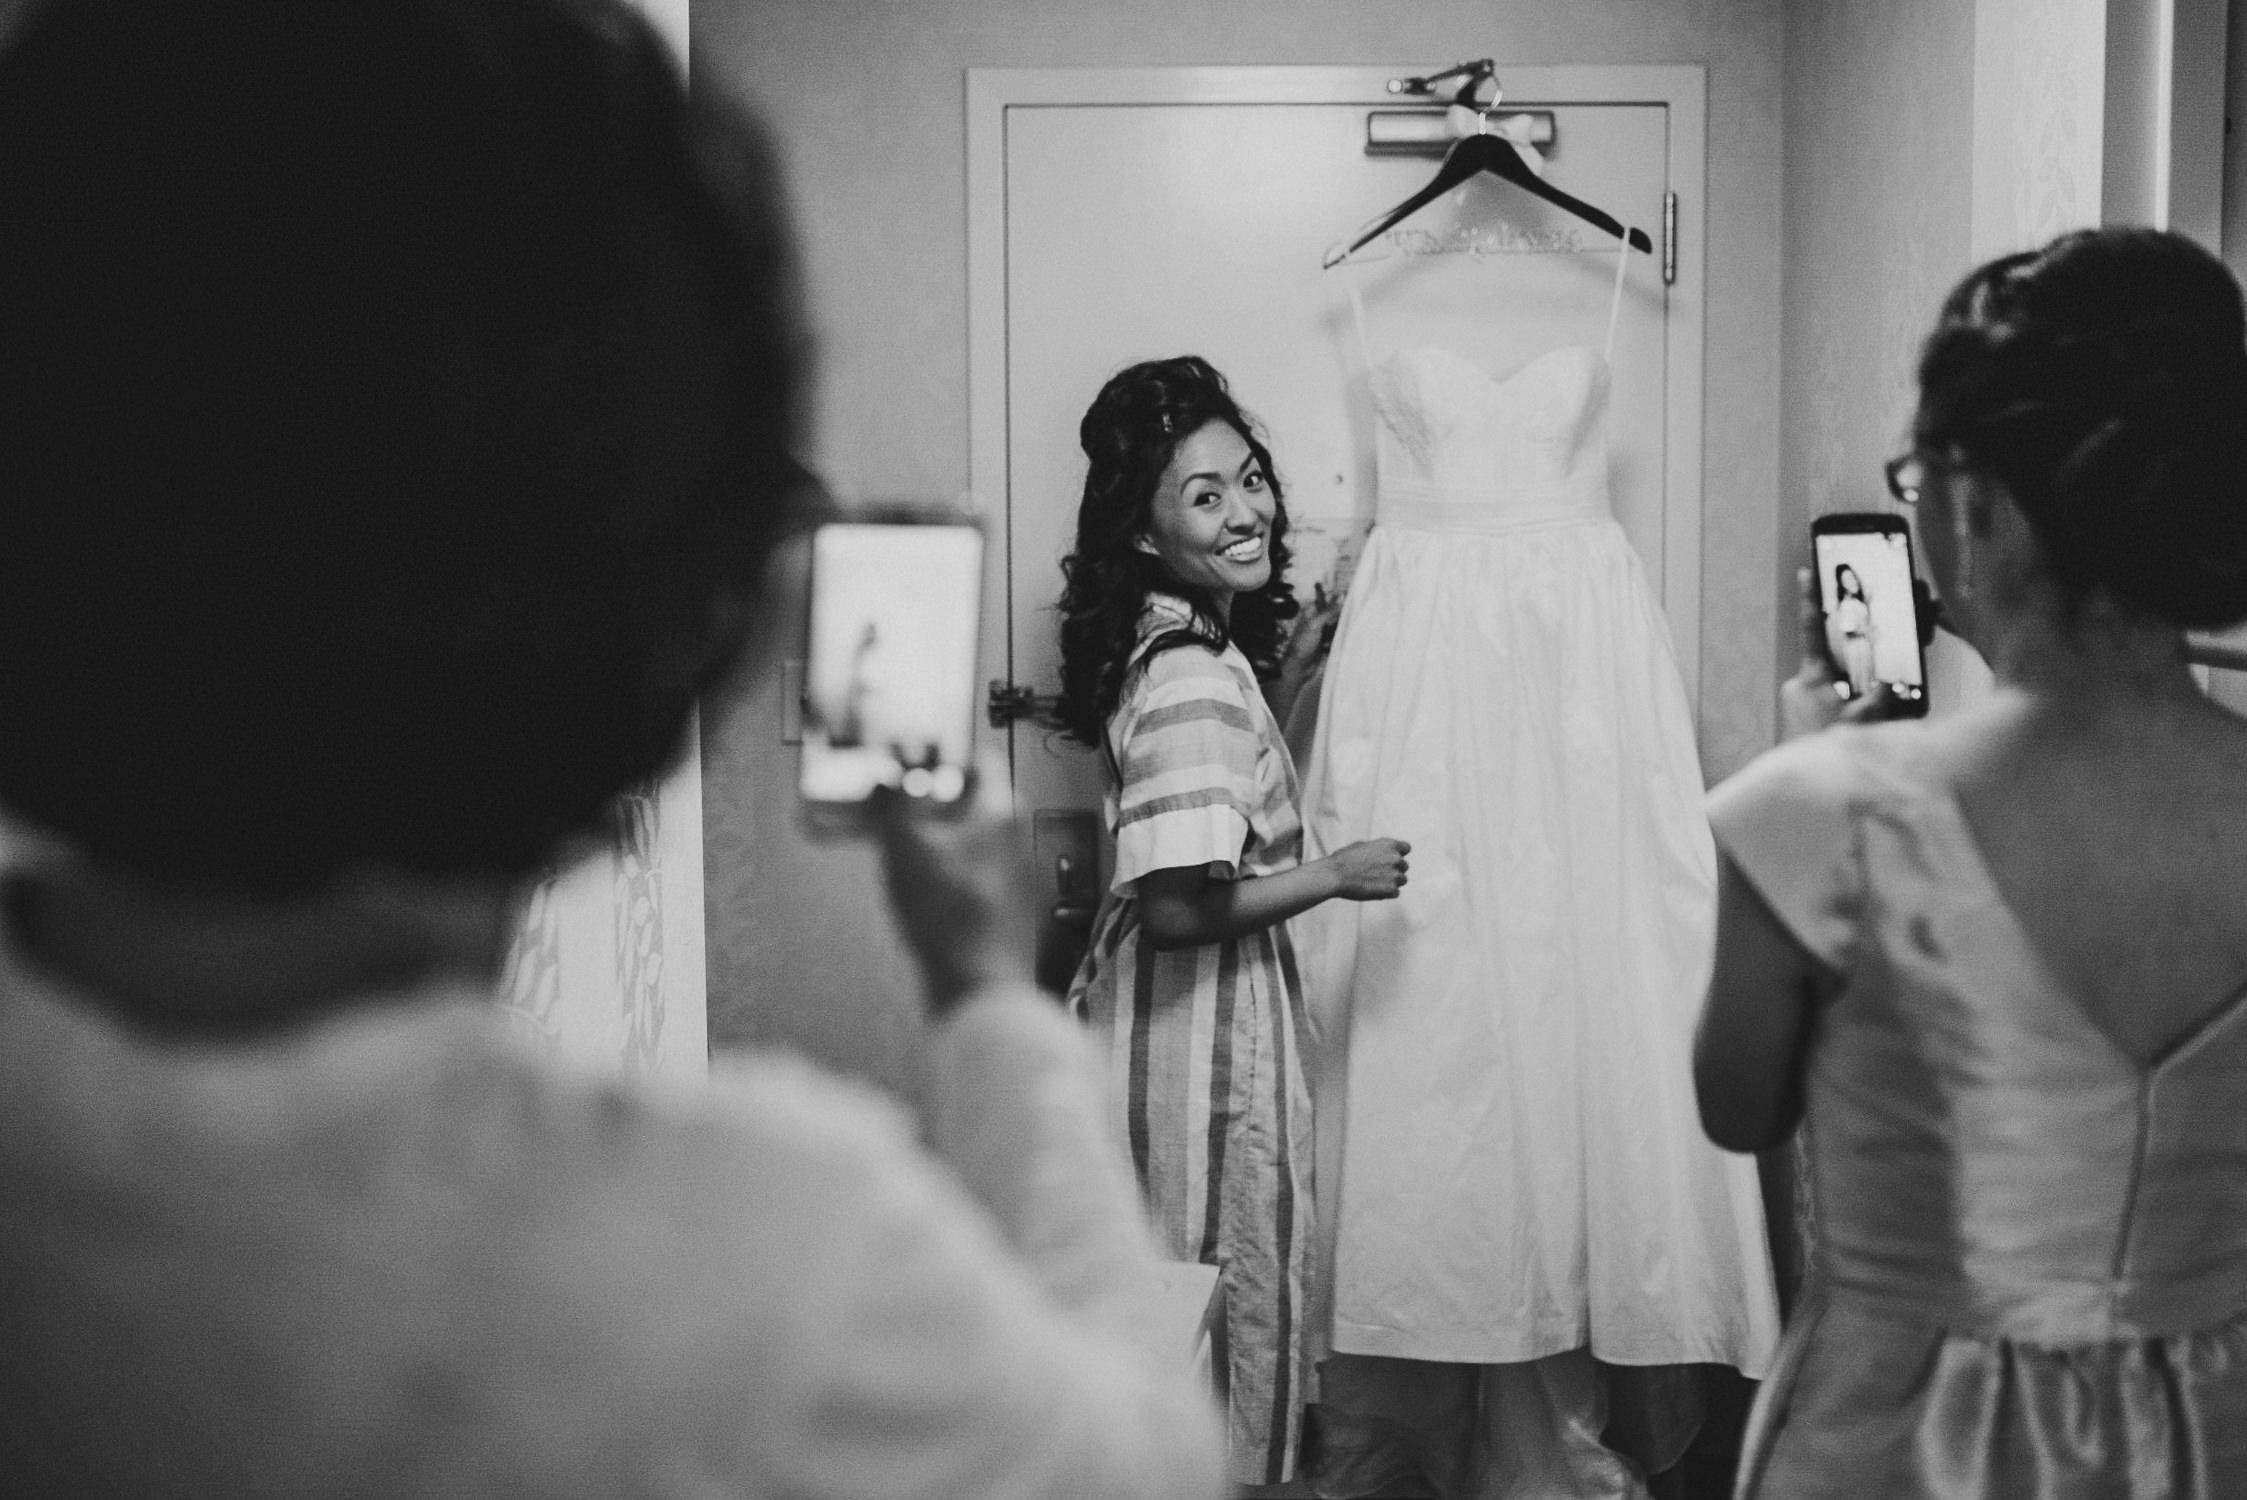 Wedding at Woodlawn Manor Sandy Spring Maryland by Mantas Kubilinskas.jpg